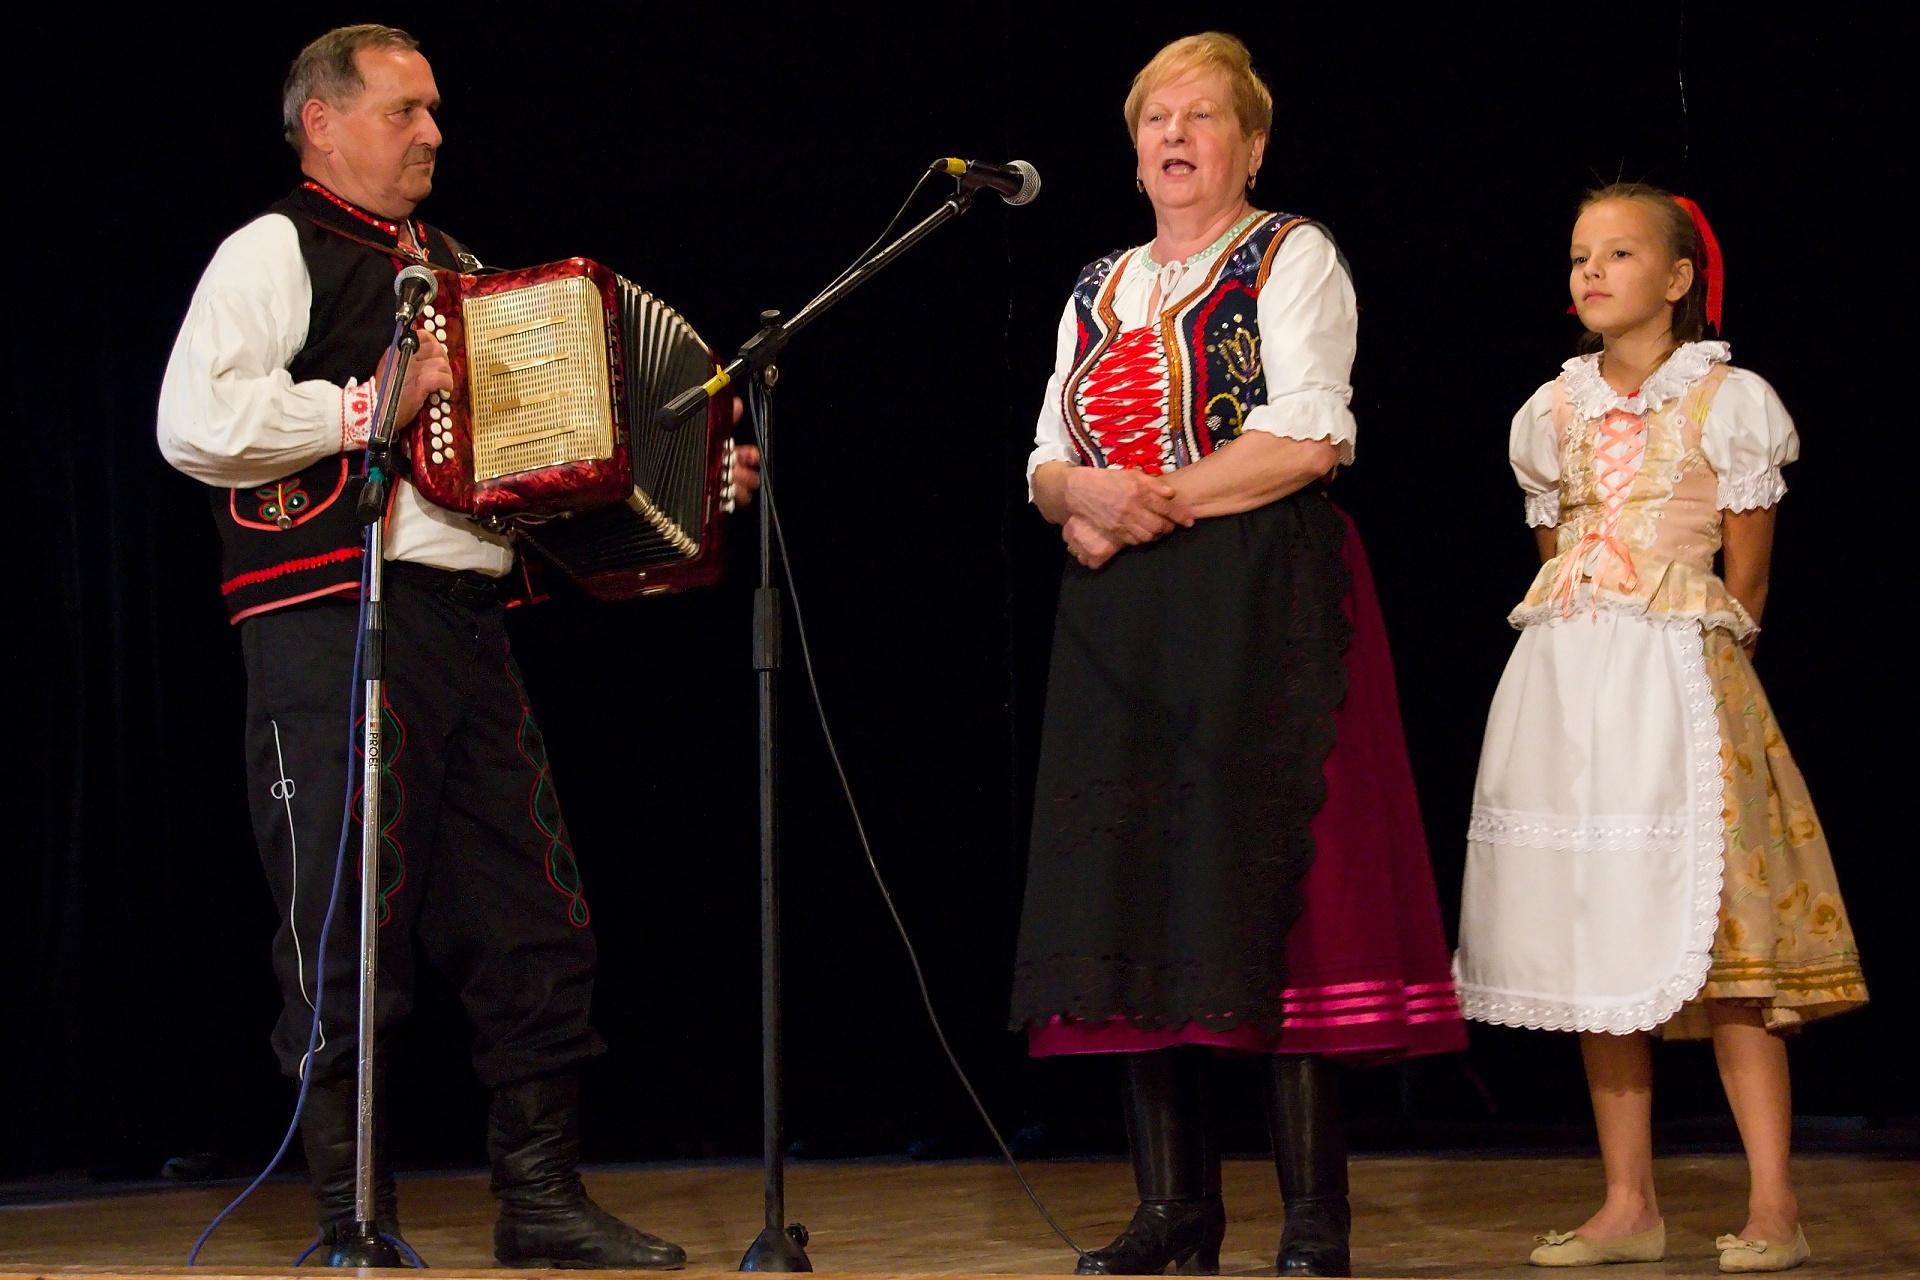 Kojšovská heligónka 2014